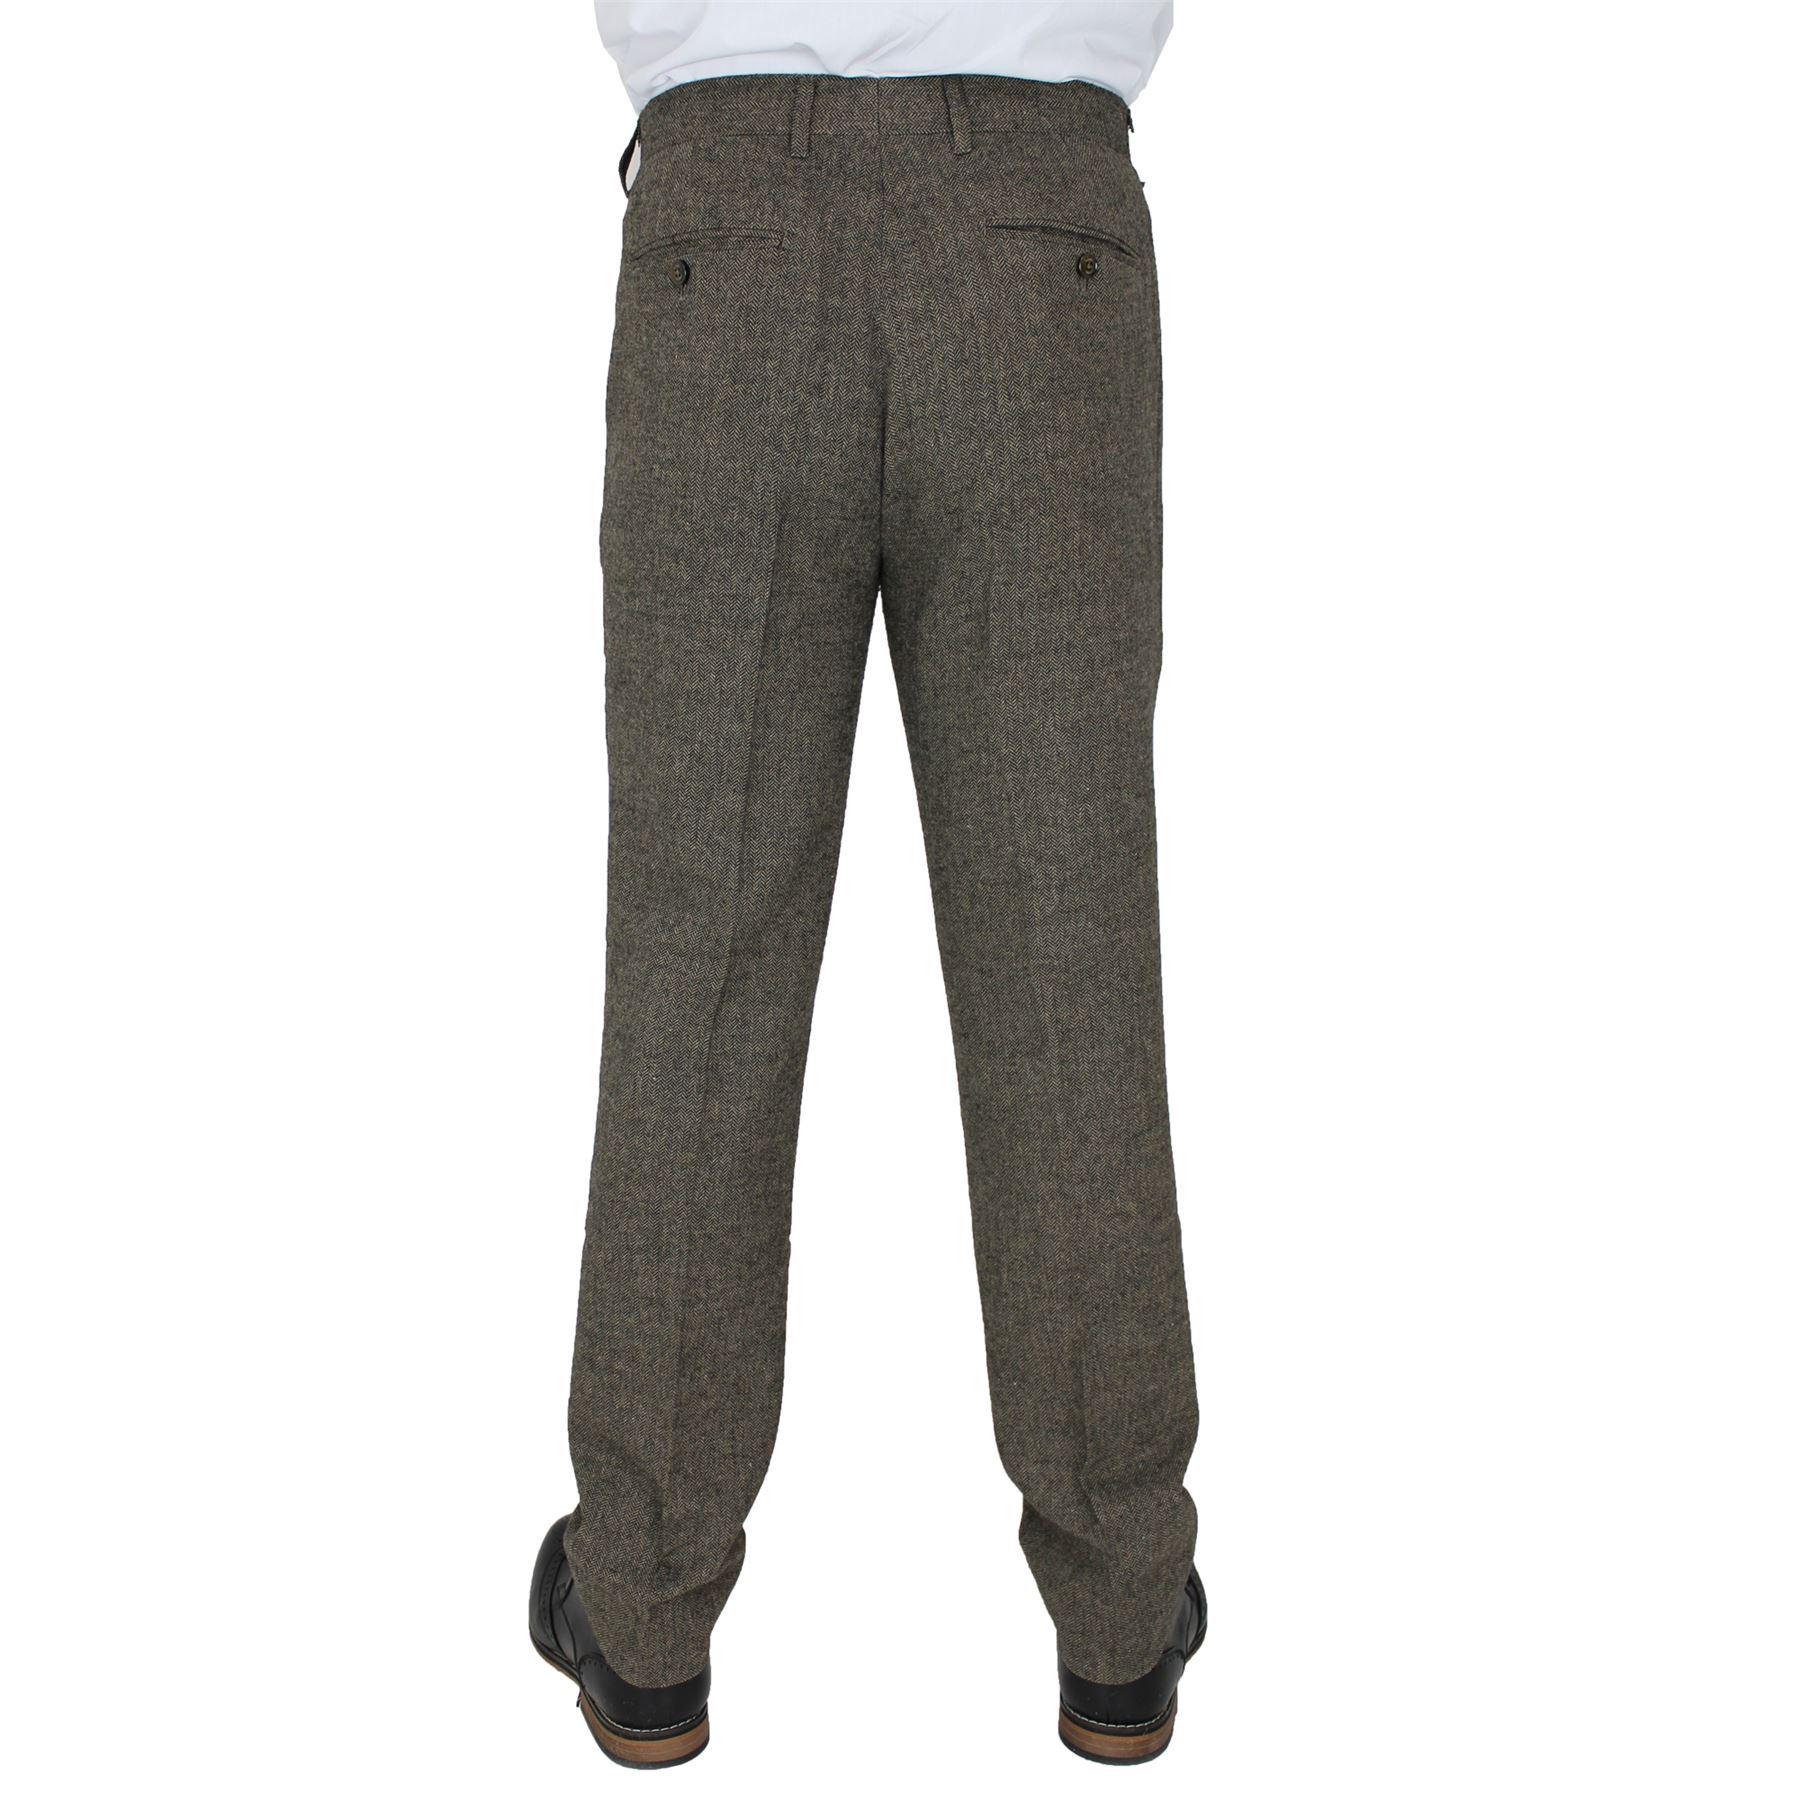 Mens-Cavani-Brown-Tweed-Blazer-Waistcoat-Trouser-3-Piece-Suit-Sold-Separately thumbnail 9